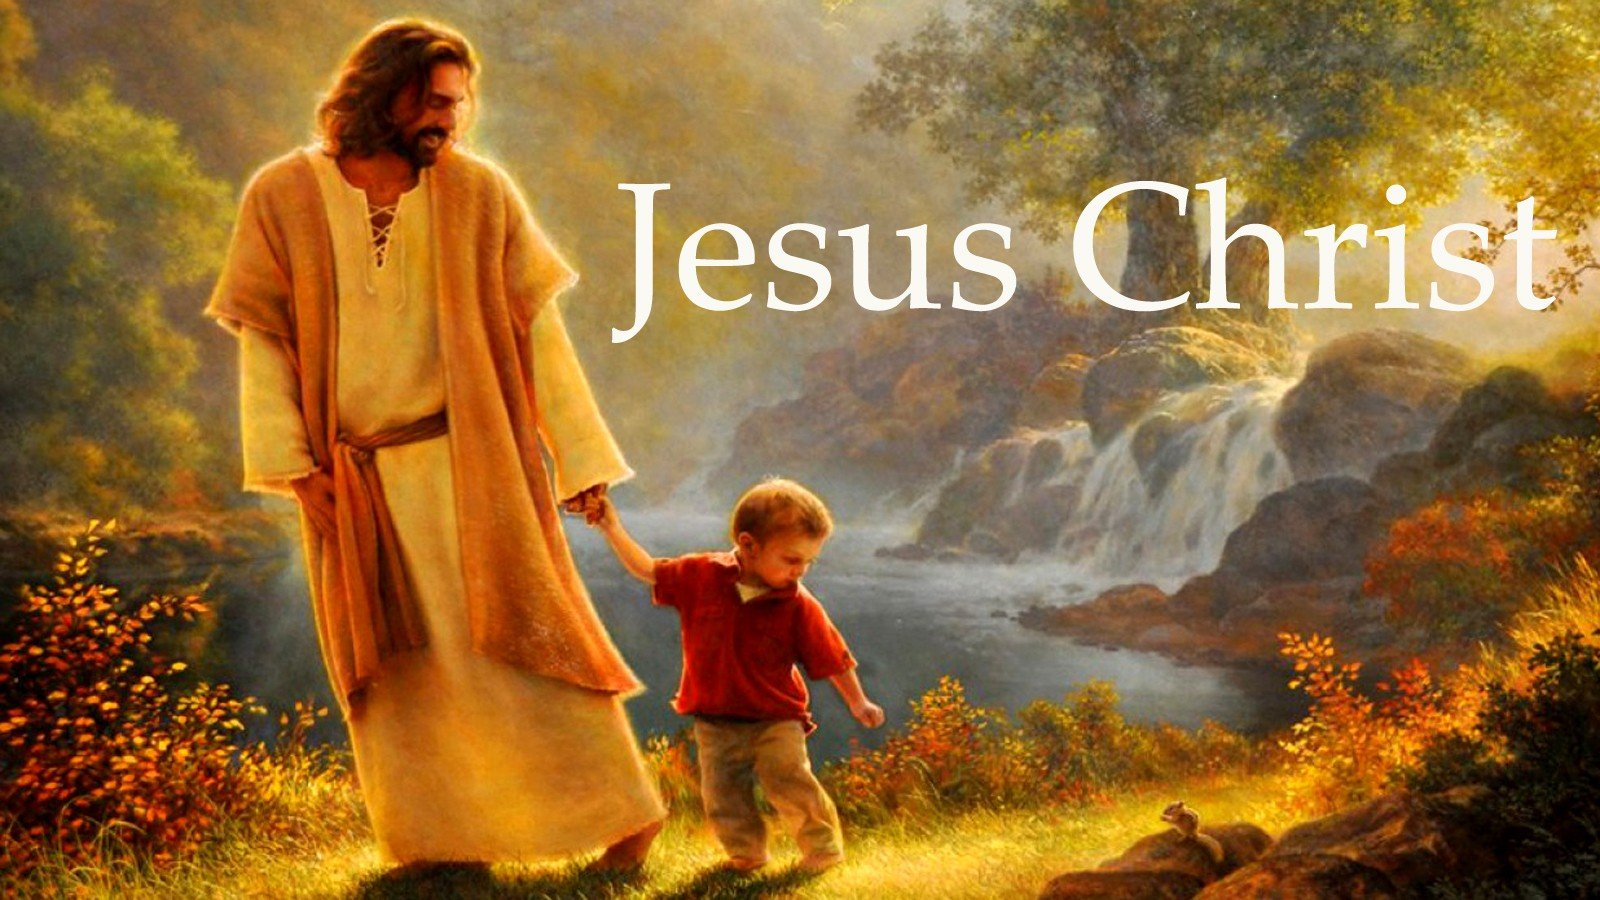 God jesus christ happy hd wallpaper Latest HD Wallpapers 1600x900